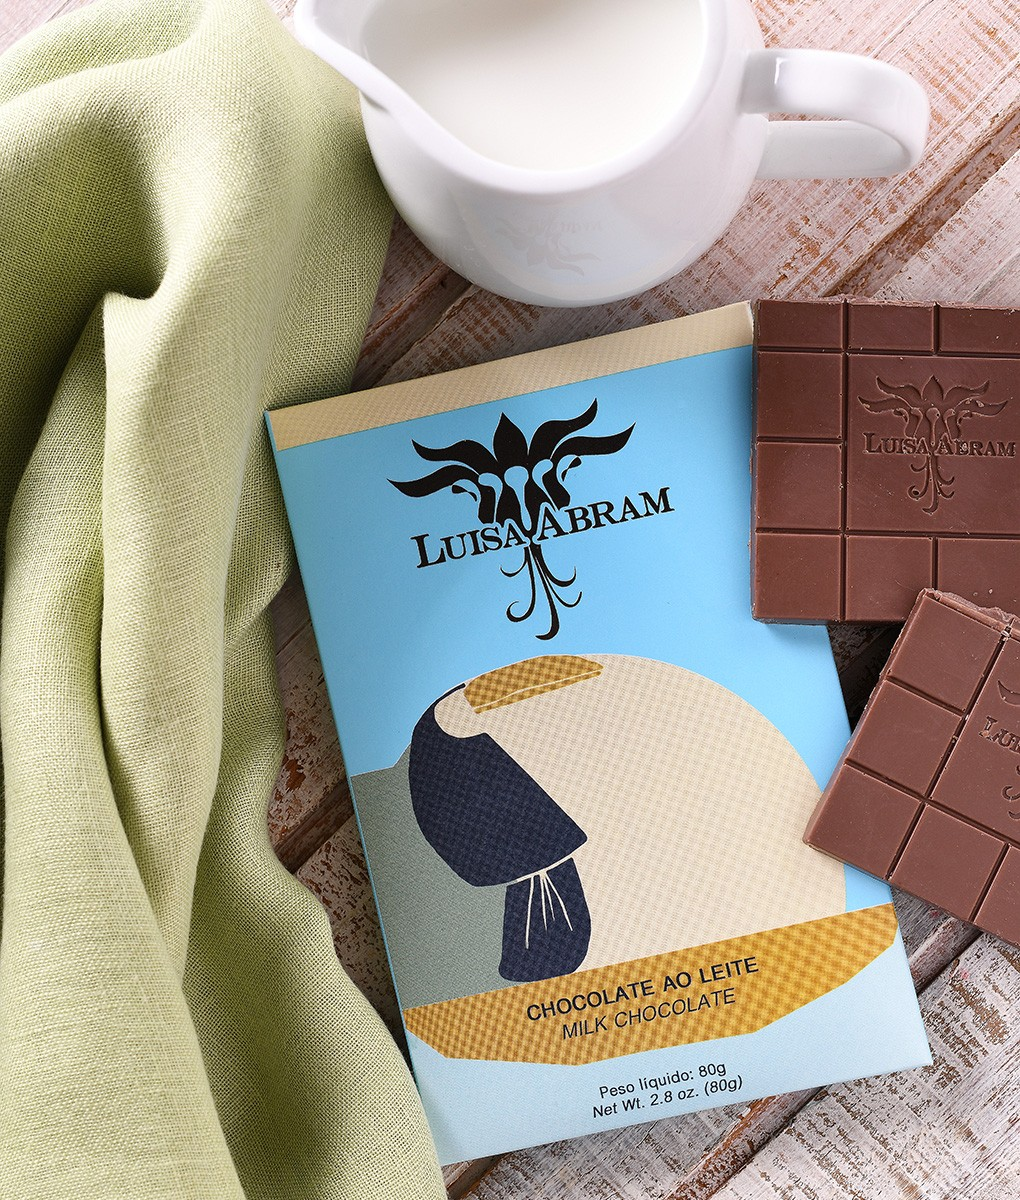 LUISA ABRAM Chocolate | Milchschokolade Brazil »Chocolate ao Leite« 42%